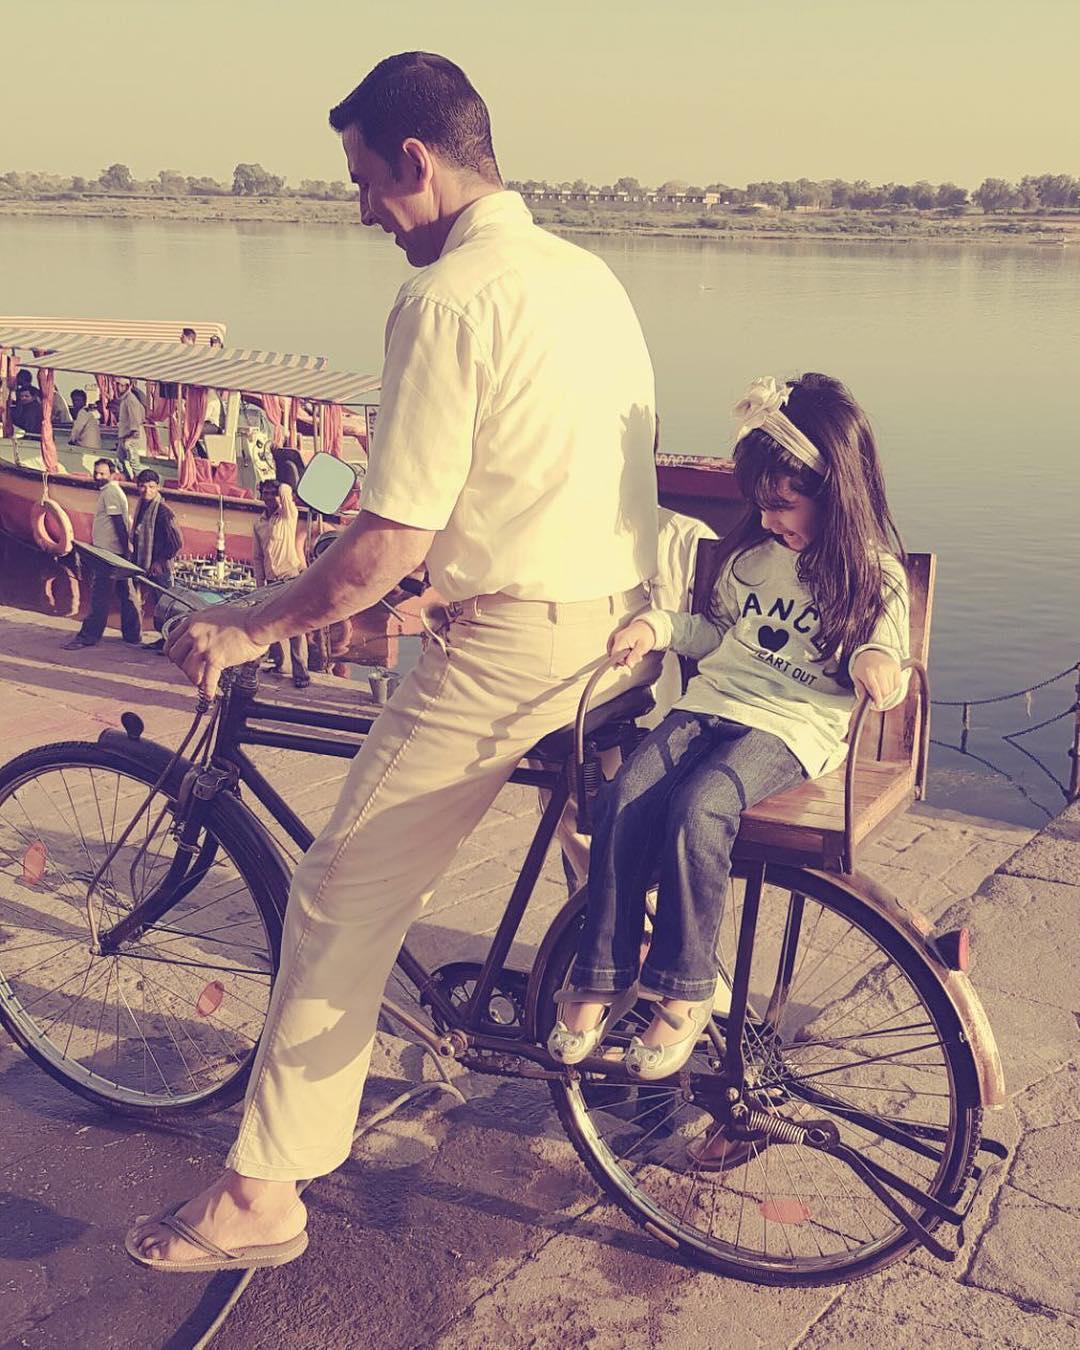 5 Reasons Why Akshay Kumar's Padman is Making us Super Excited